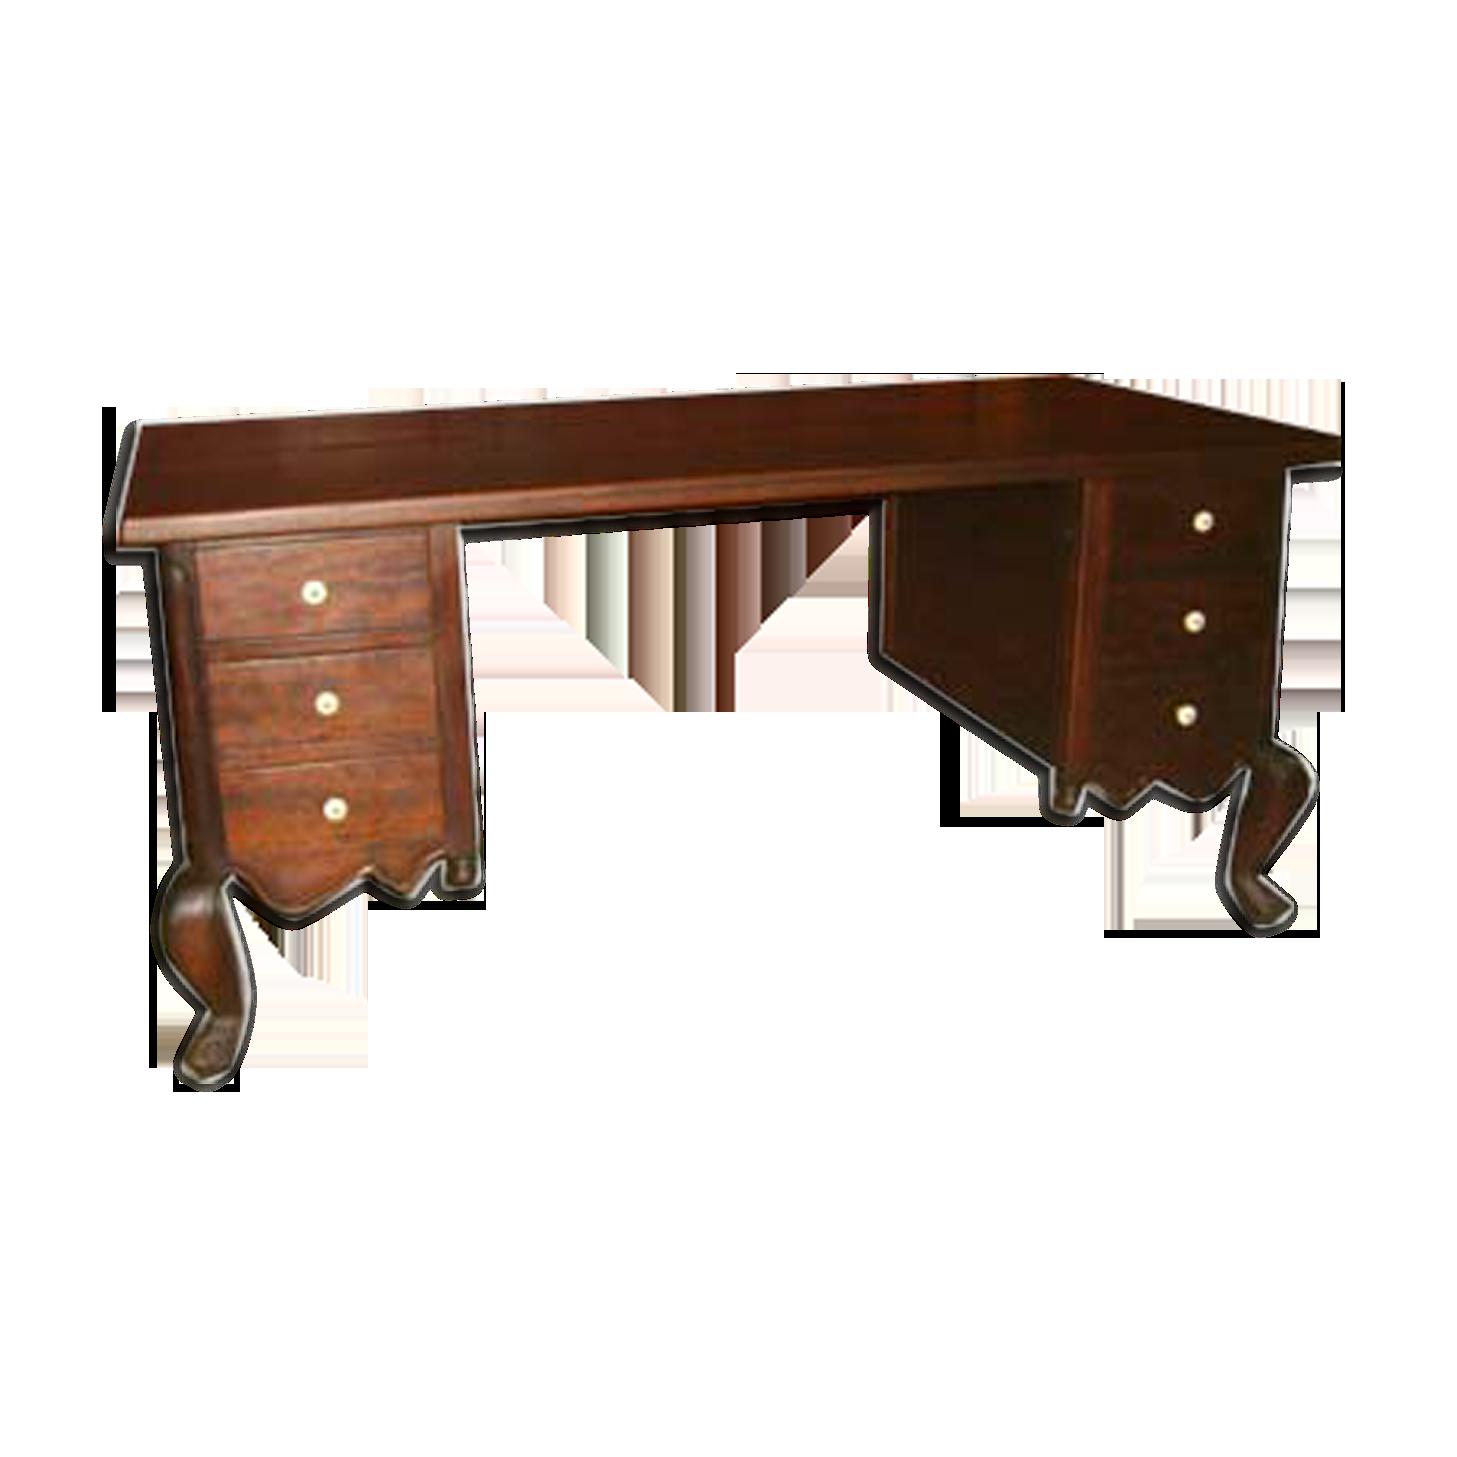 Bureau colonial bois matériau marron éthnique txd fug